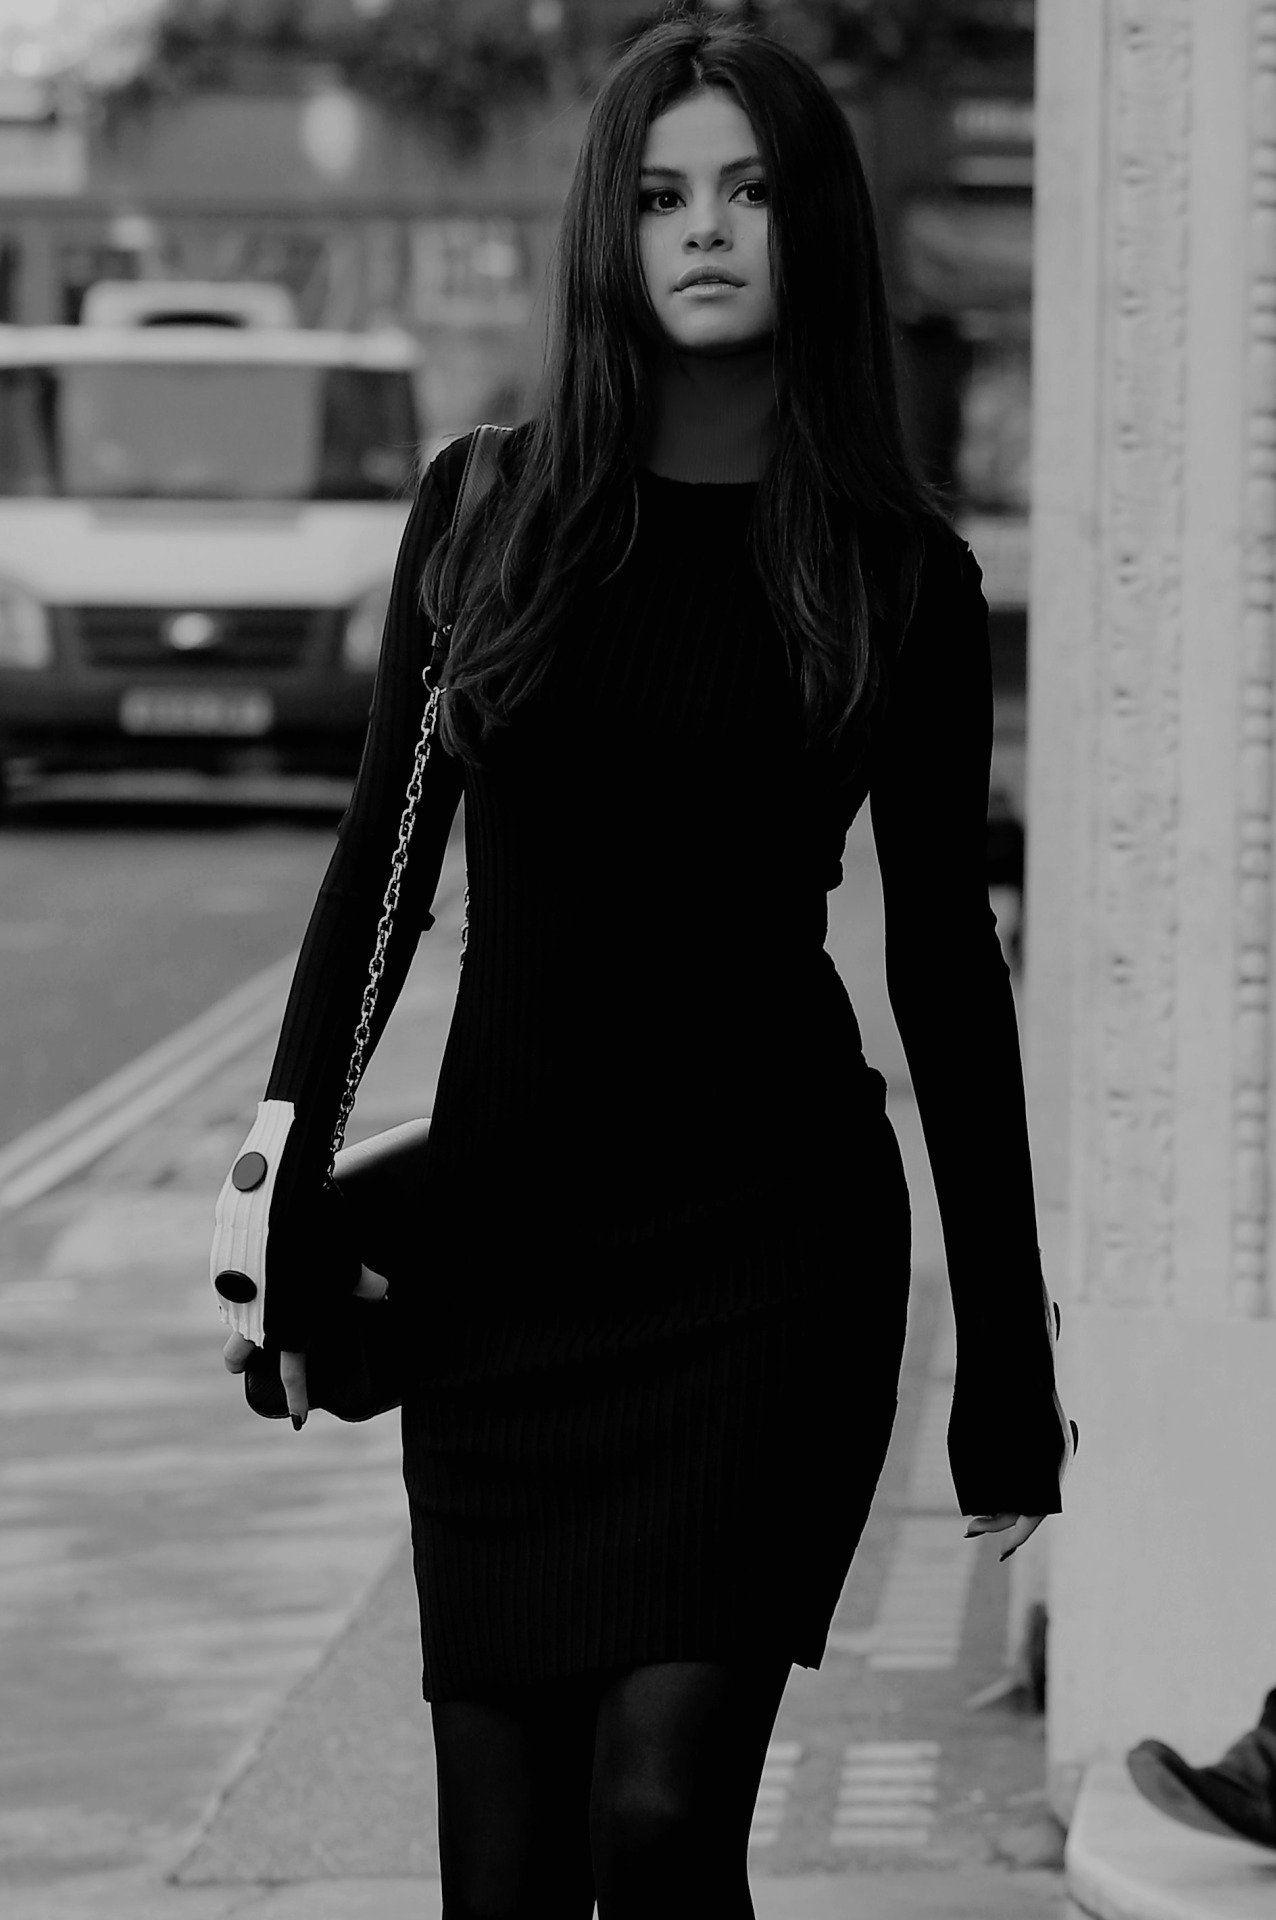 Selina Gomez | hot musical women in 2019 | Selena gomez style, Selena gomez, Selena gomez outfits